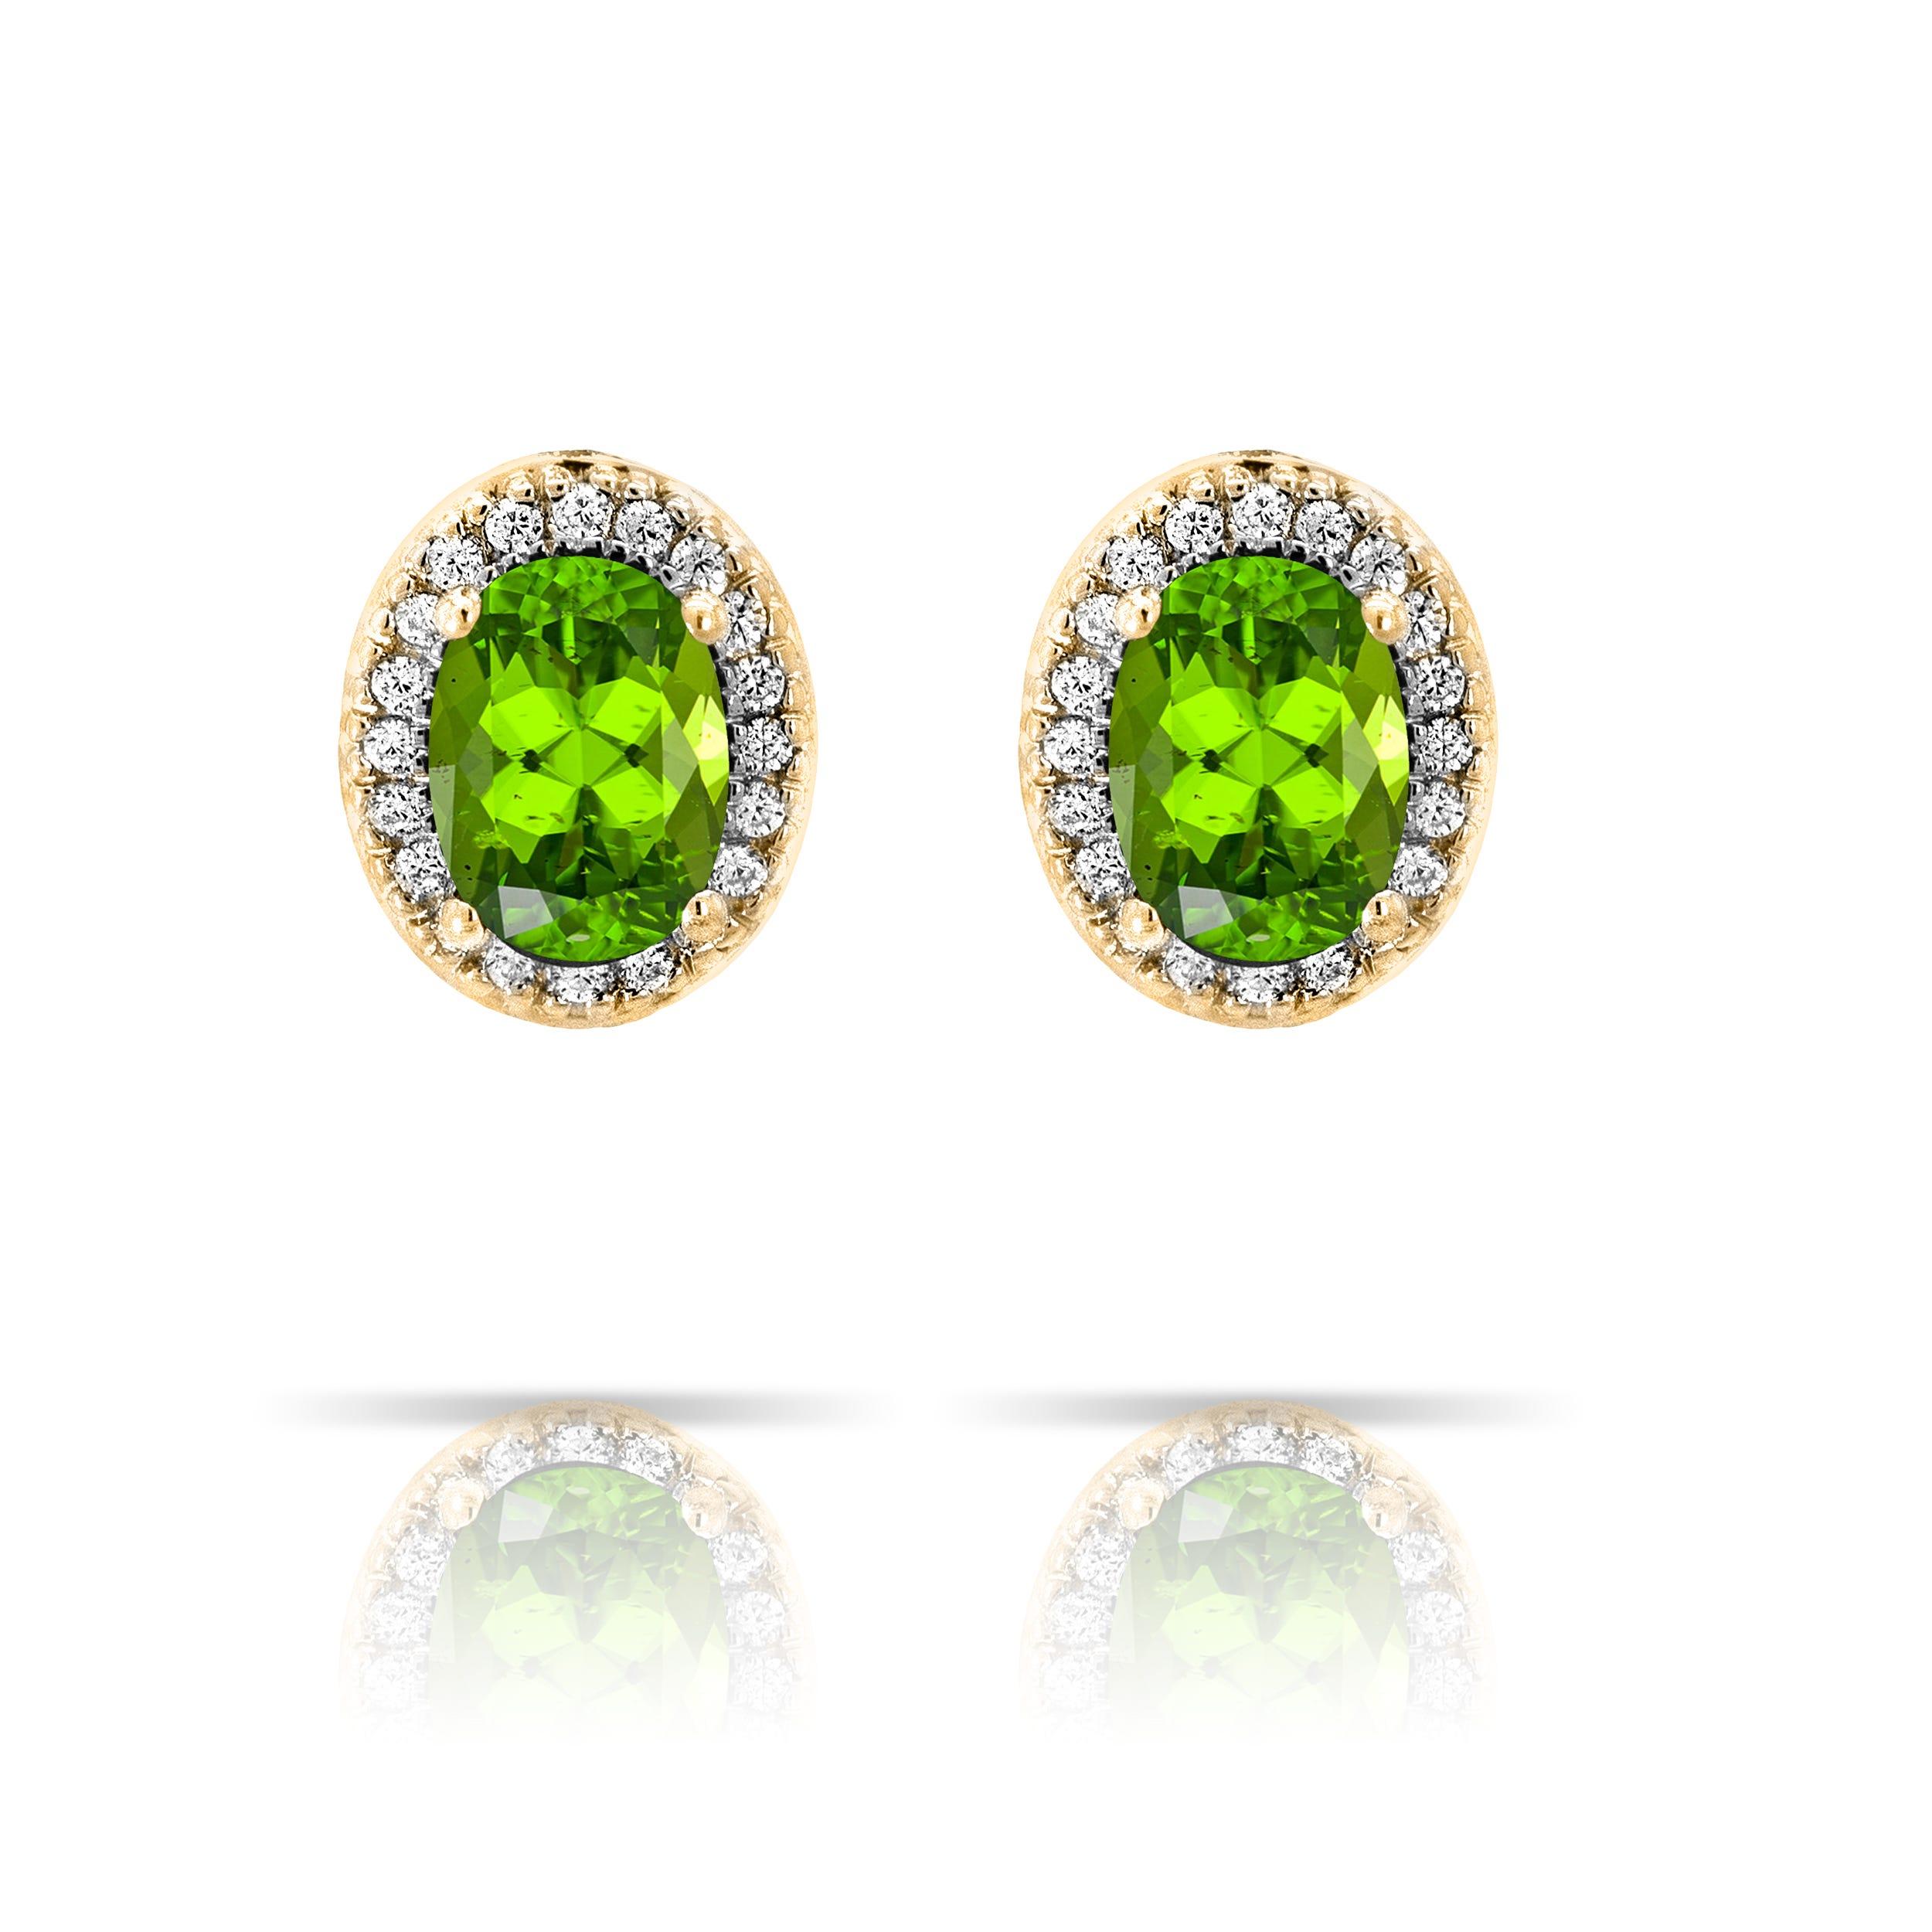 Peridot & Diamond Oval Earrings in 10k Yellow Gold